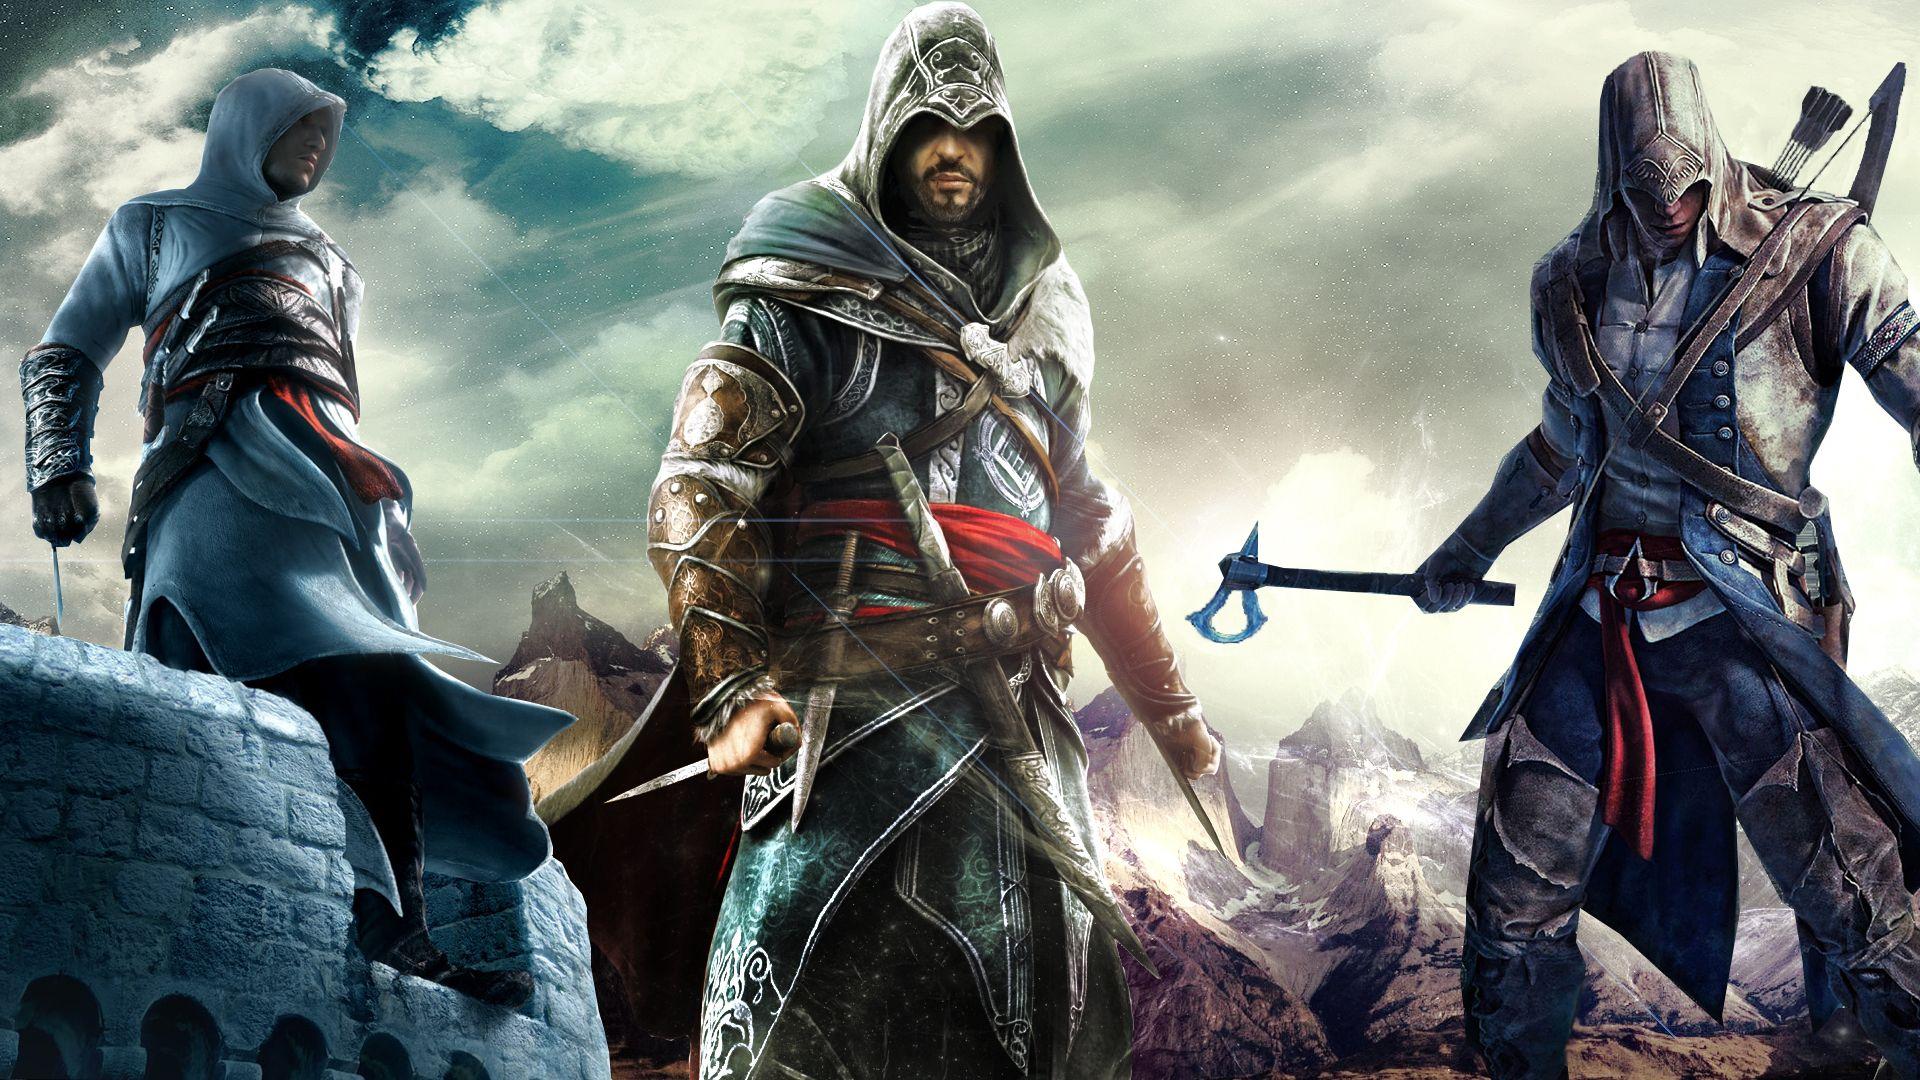 1920x1080 Wallpaper Assassins Creed 2 Desmond Miles Peoples City Arm Cloak Assassins Creed 2 Assassins Creed Ii Assassins Creed